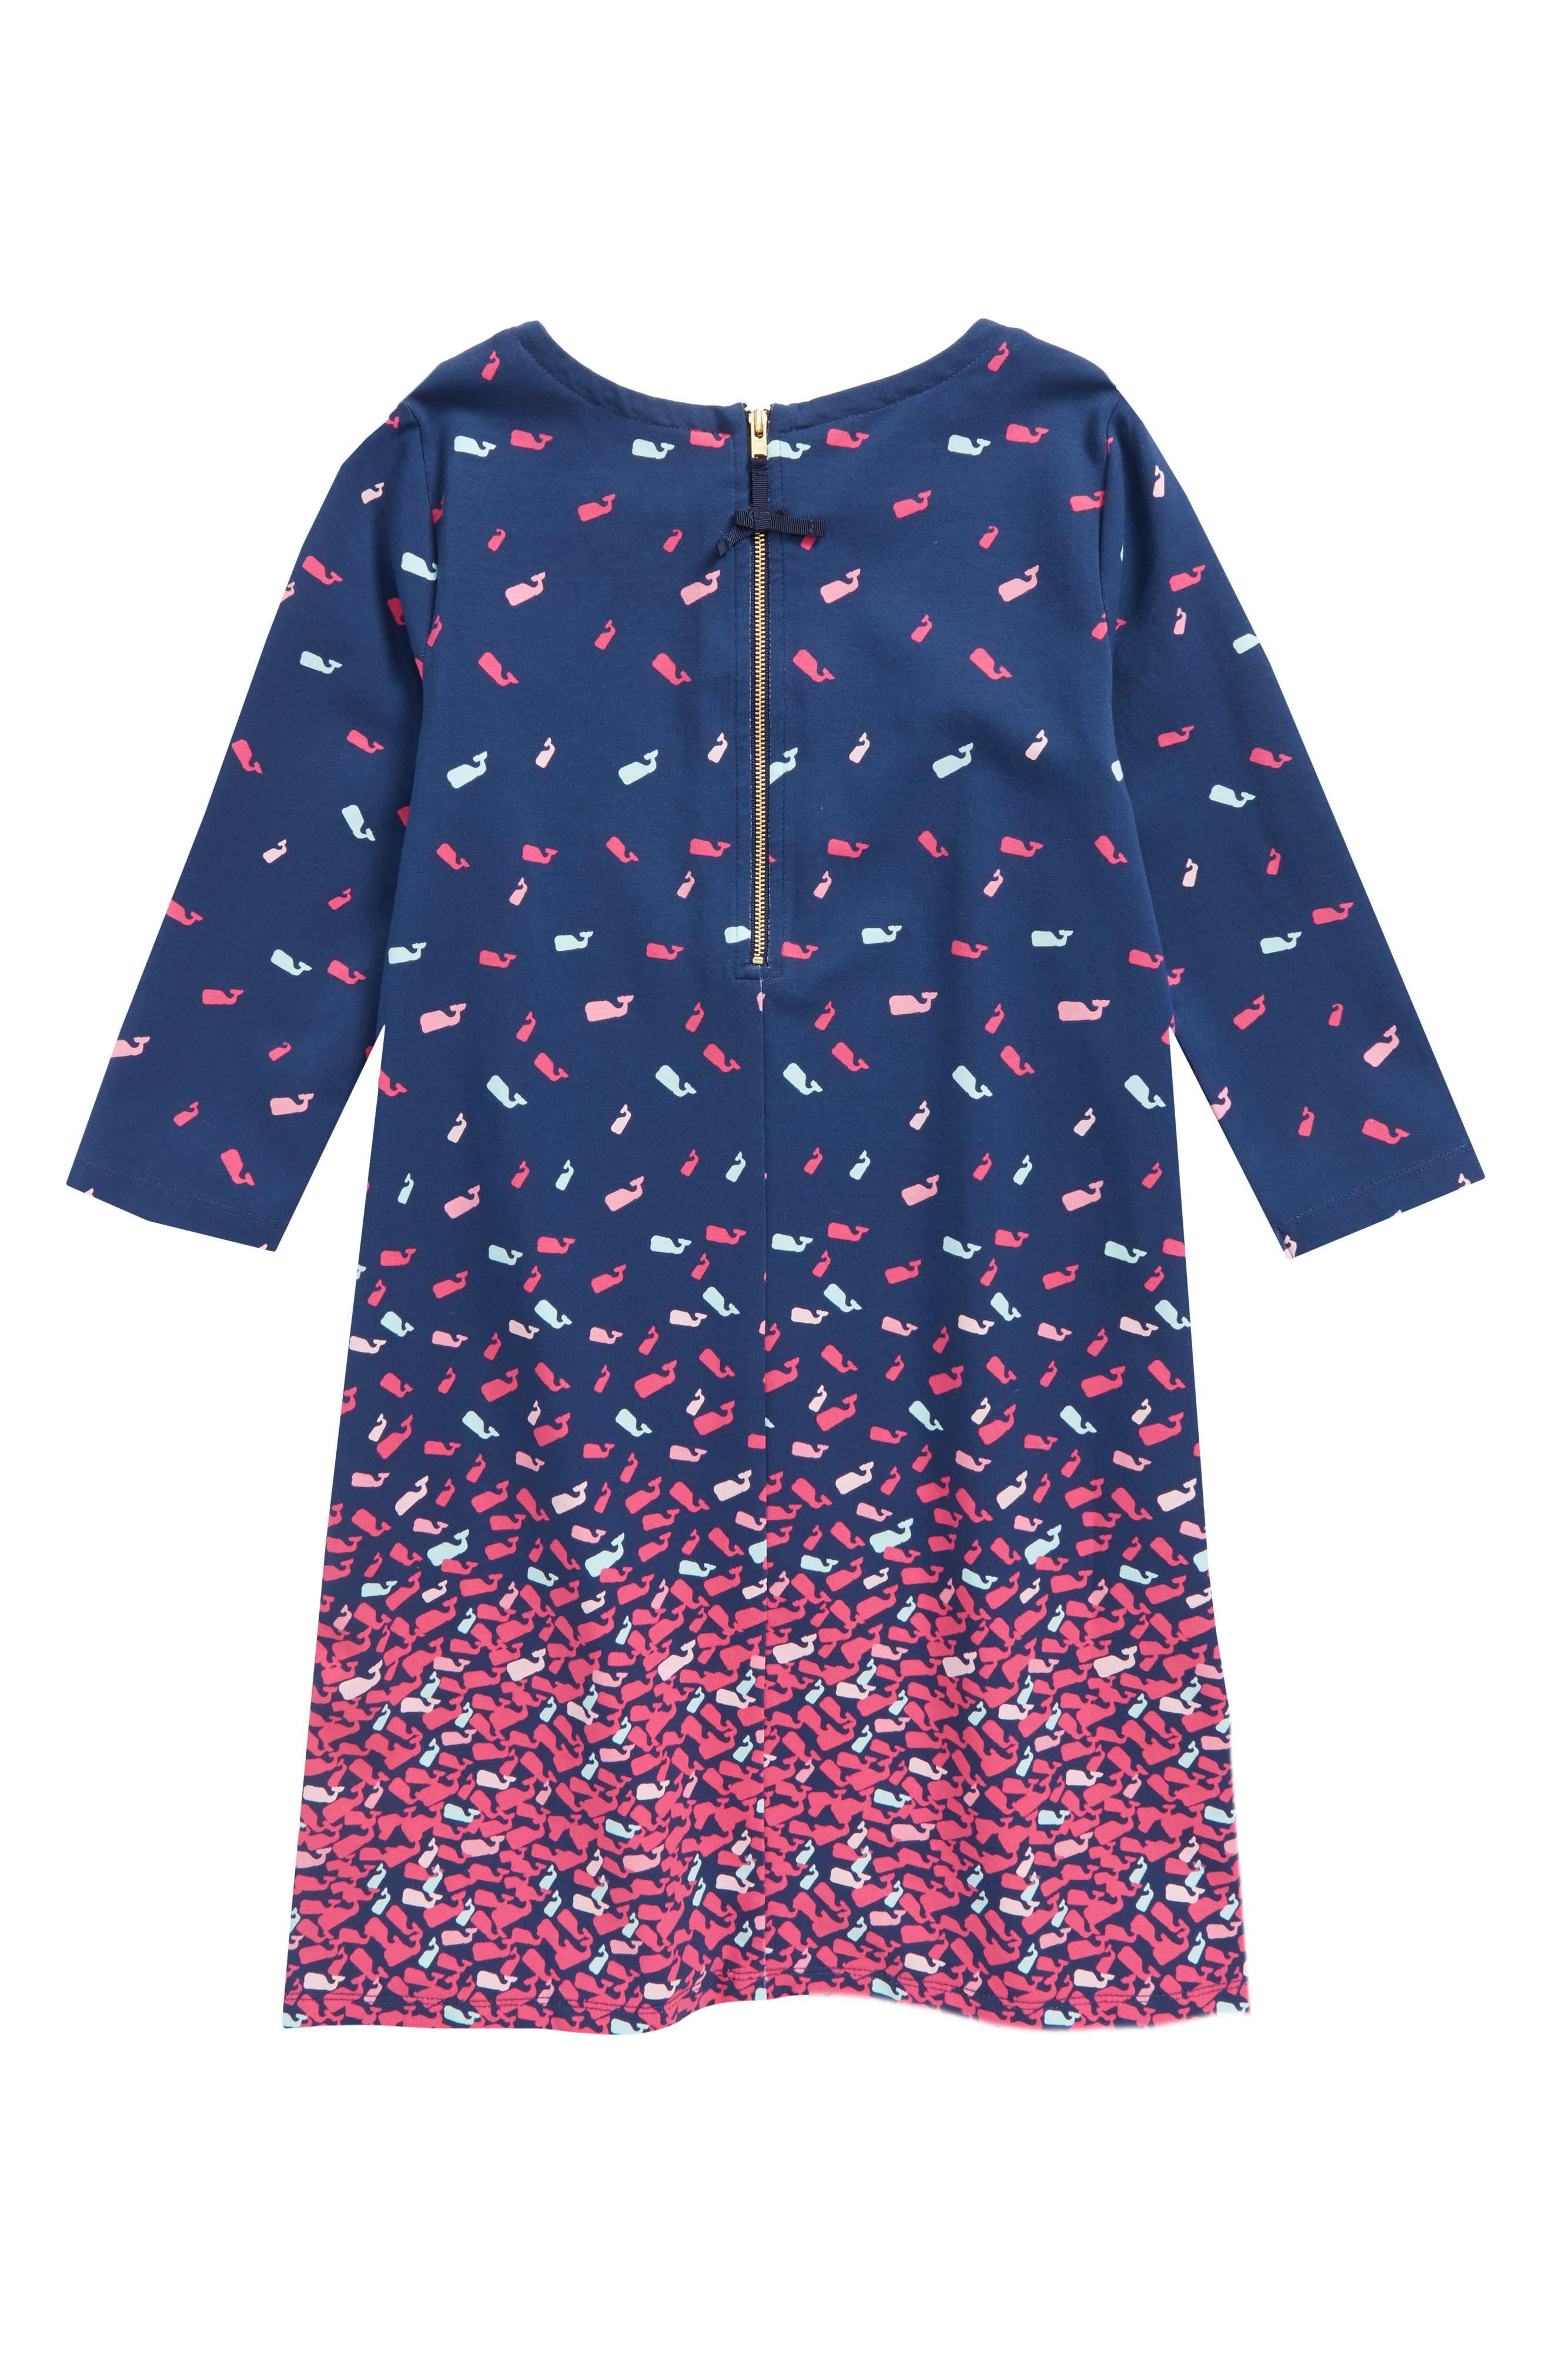 Alternate Image 2  - vineyard vines Gradient Whale Print Shift Dress (Toddler Girls, Little Girls & Big Girls)